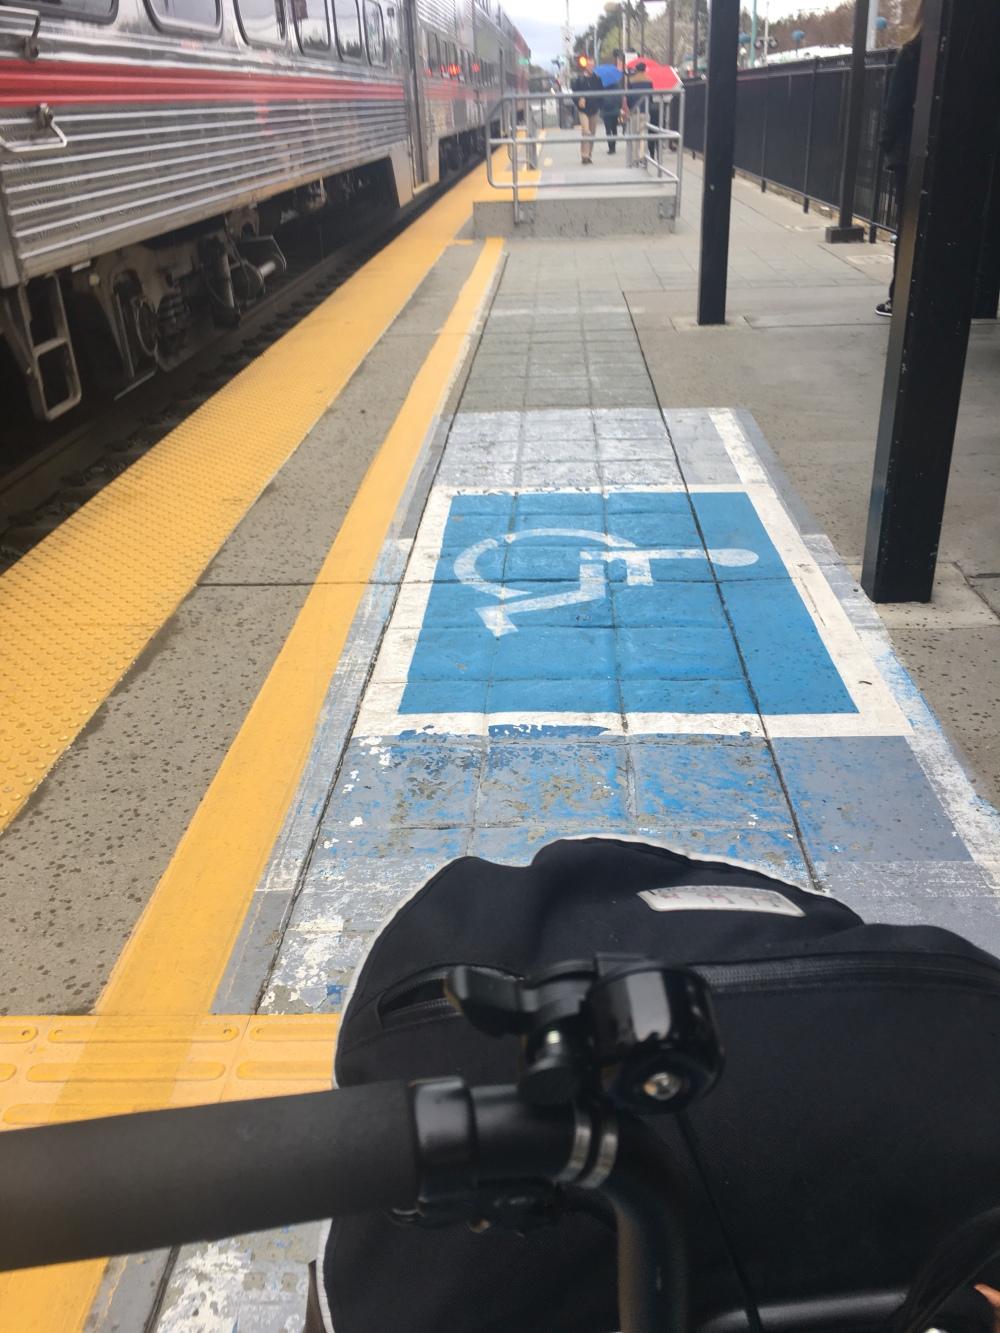 train platform view